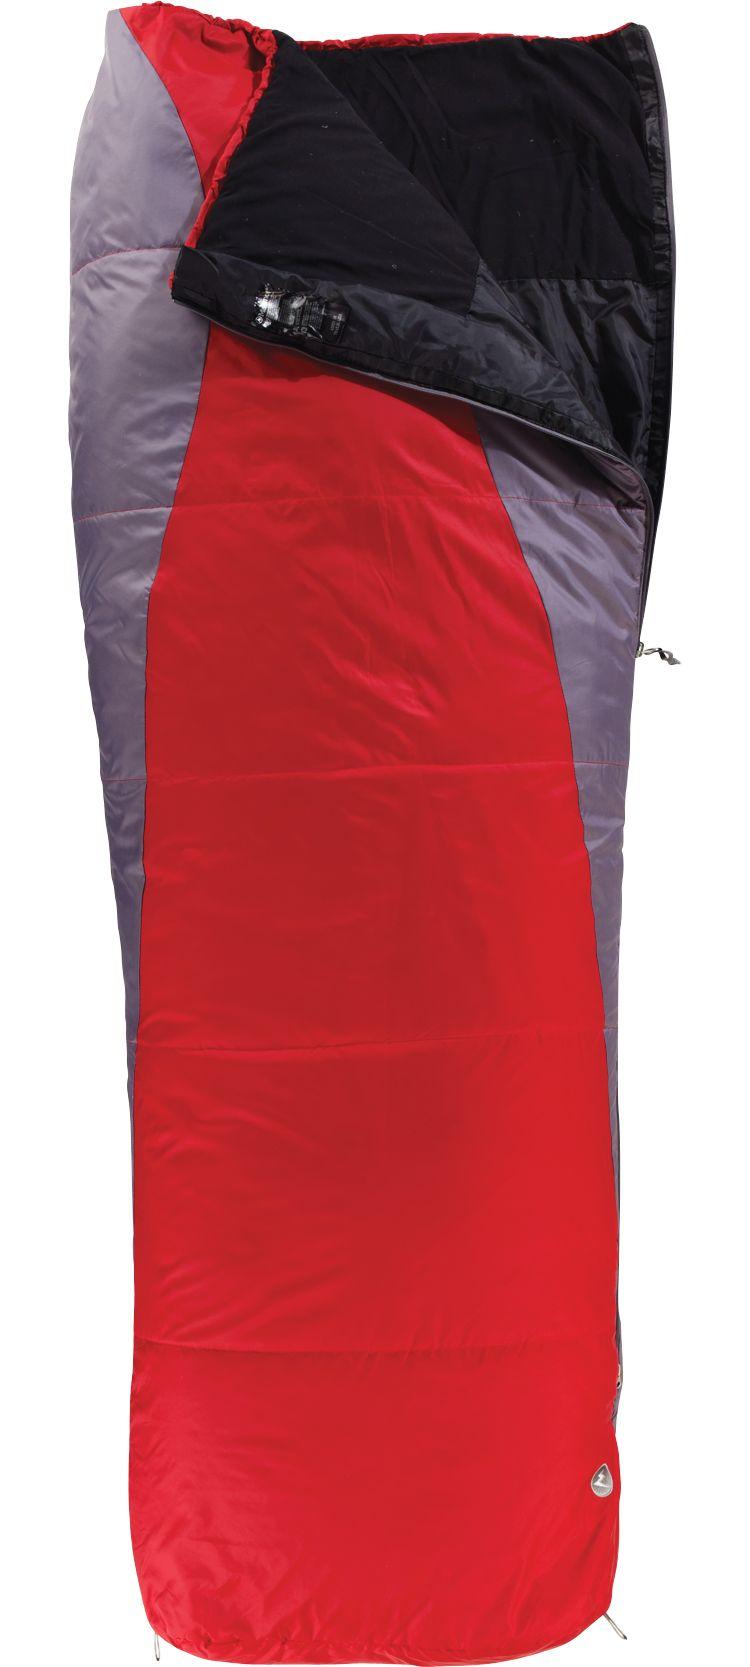 noImageFound ???  sc 1 st  DICKu0027S Sporting Goods & Marmot Aspen Trailblazer 40 u0026deg; Sleeping Bag | DICKu0027S Sporting Goods